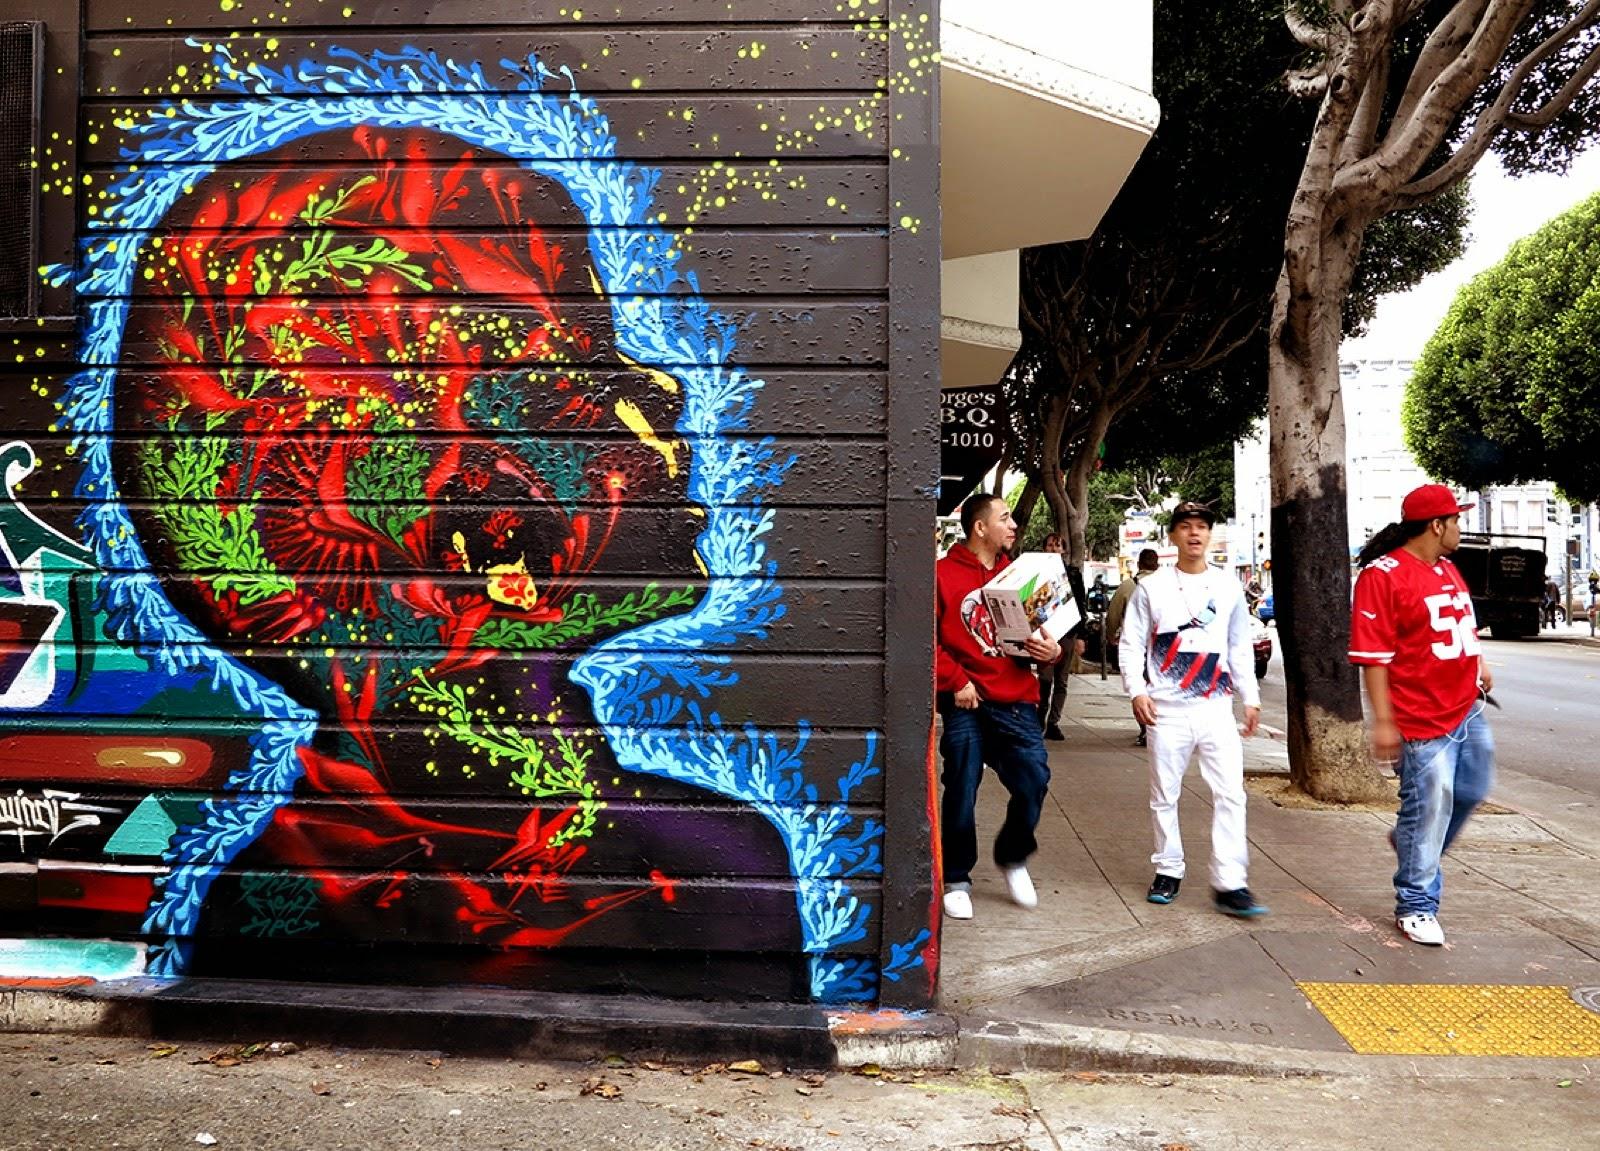 Художник – Stinkfish / Стена – Сан-Франциско, США